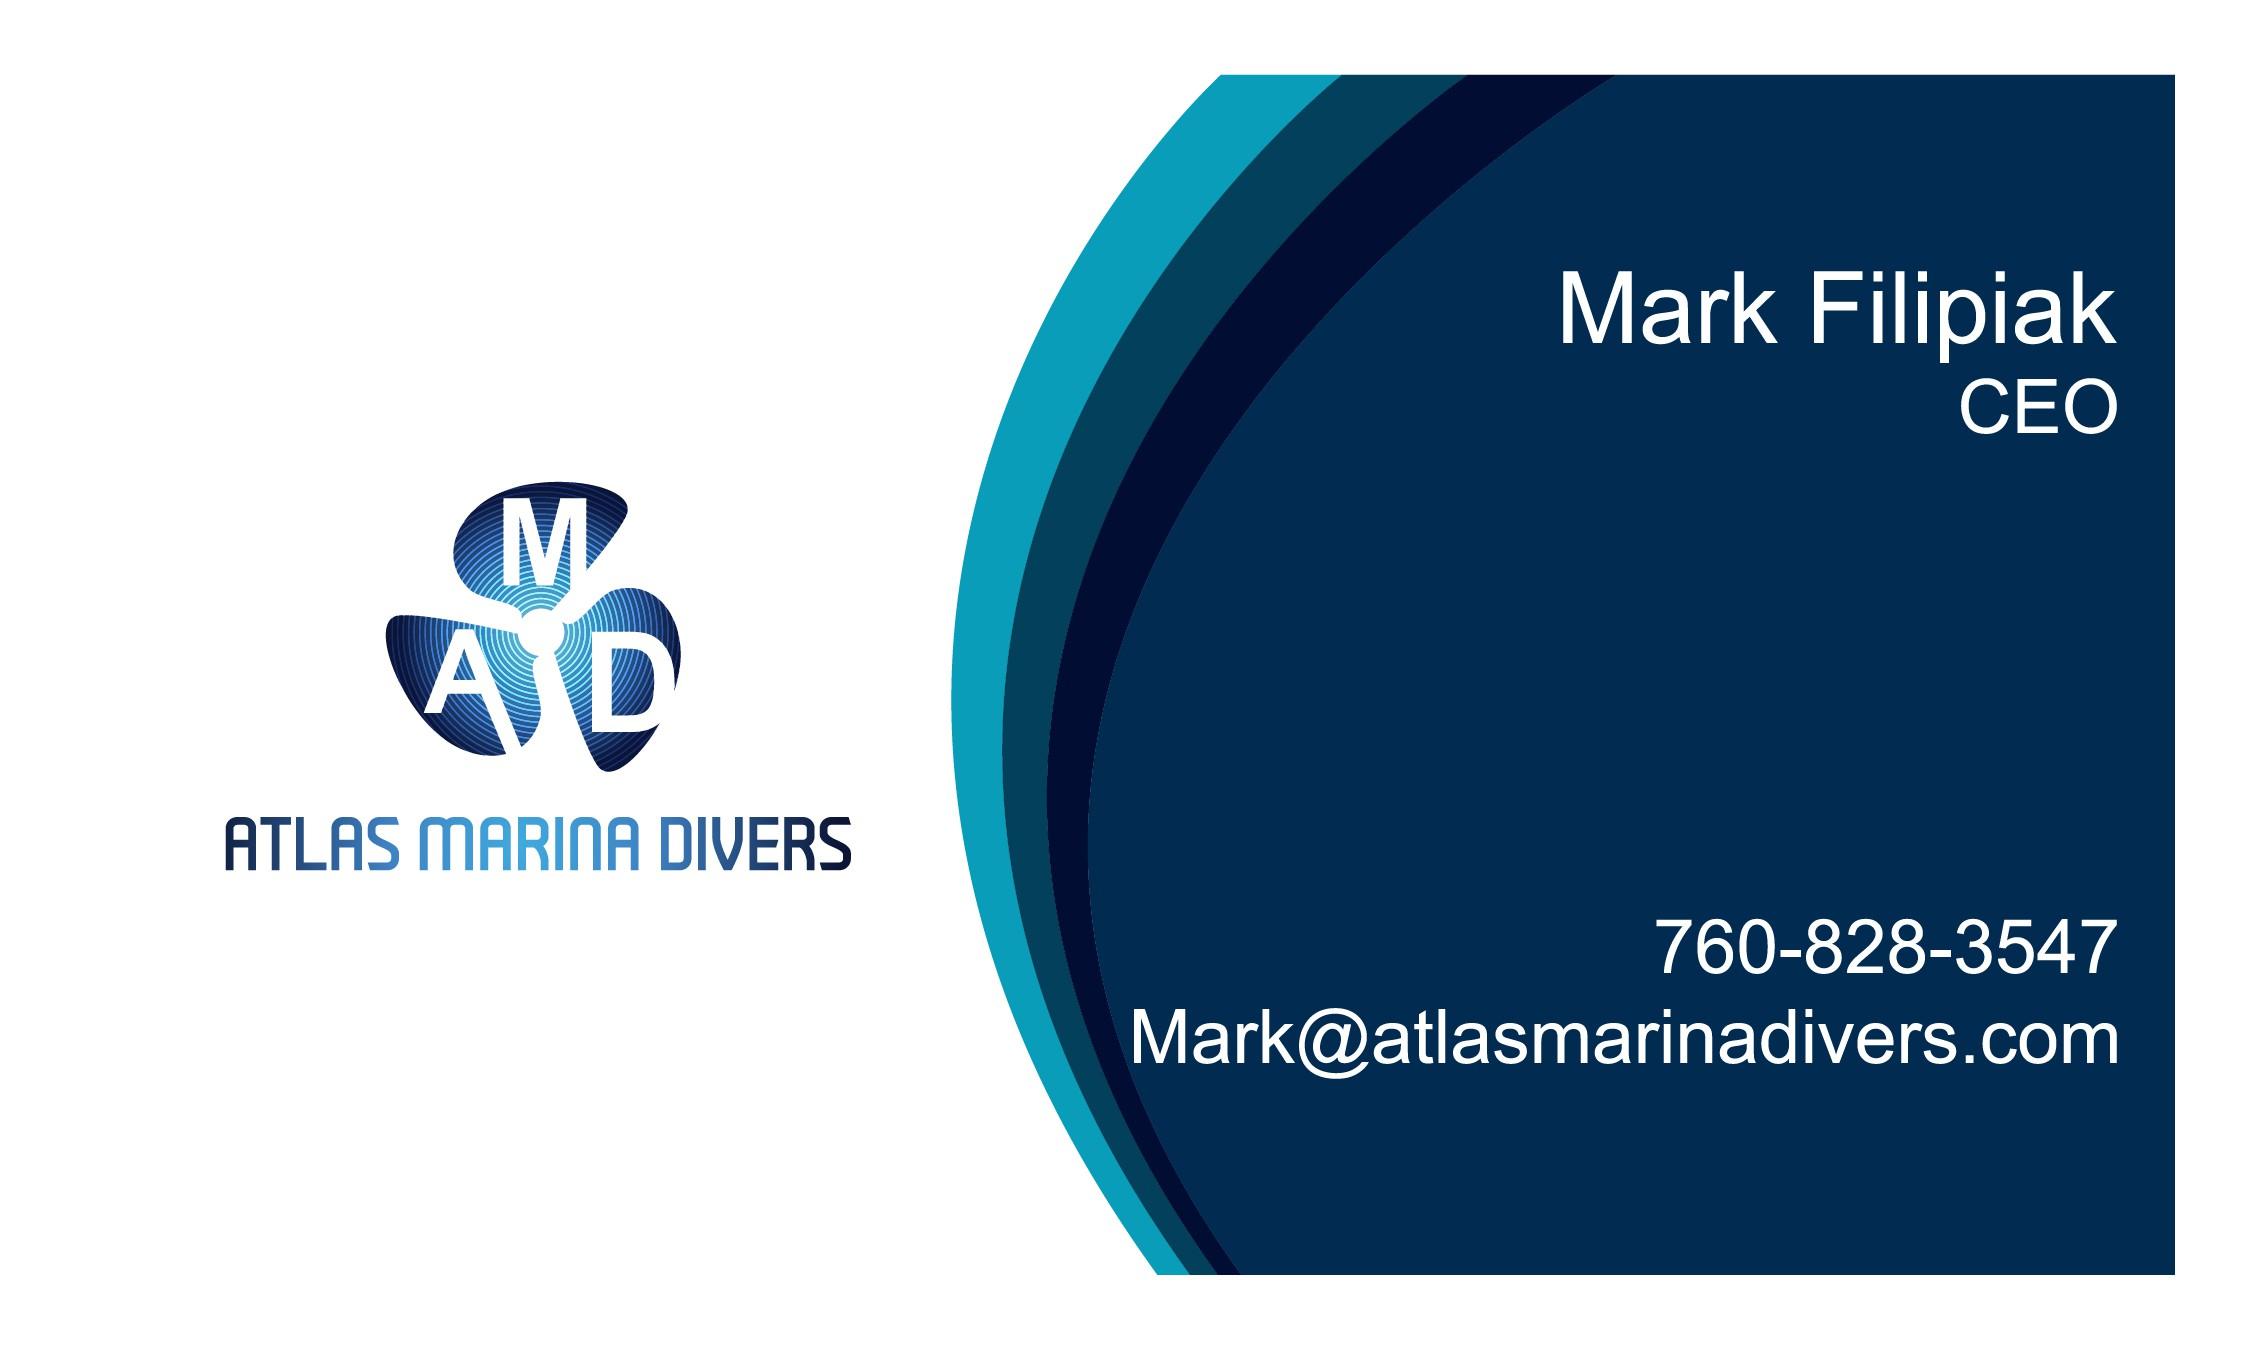 Logo and business card rush job